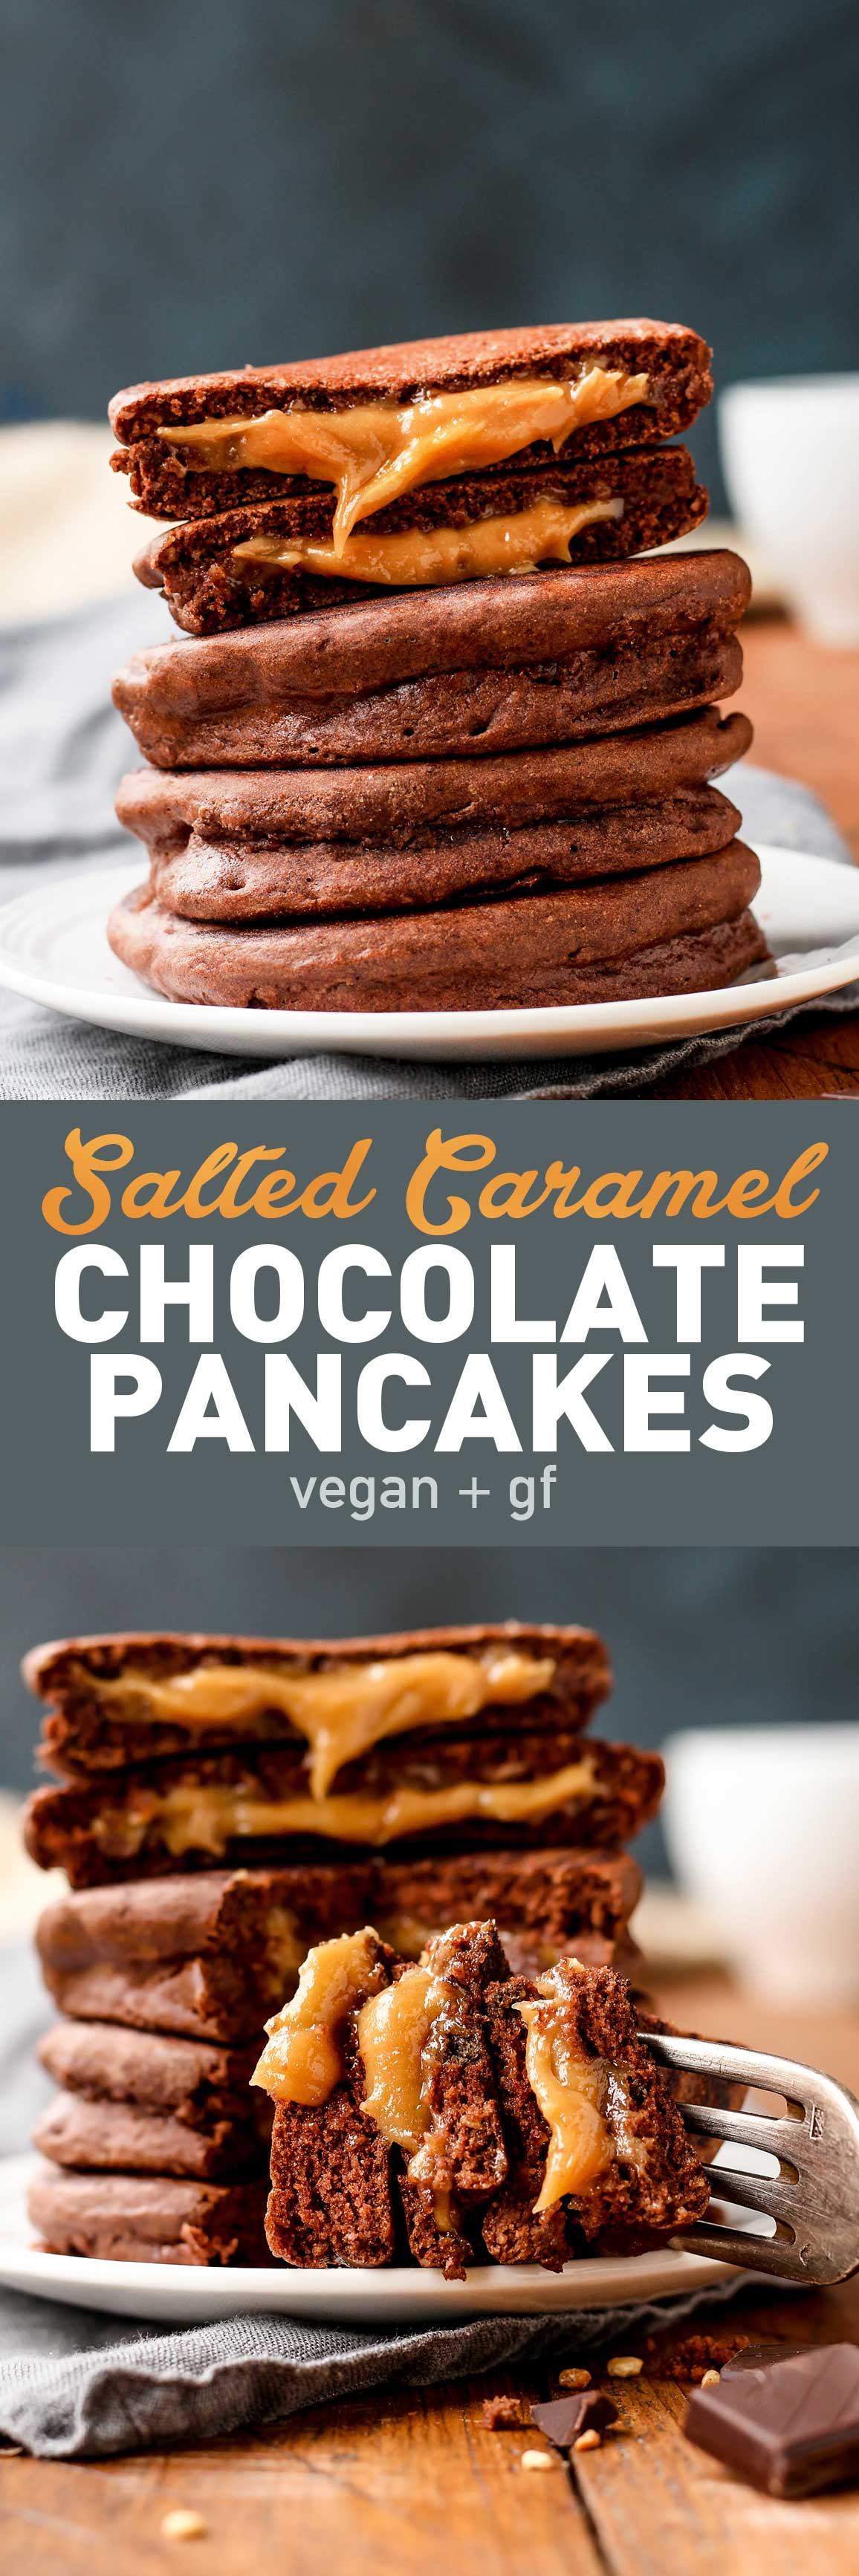 Salted Caramel Chocolate Pancakes